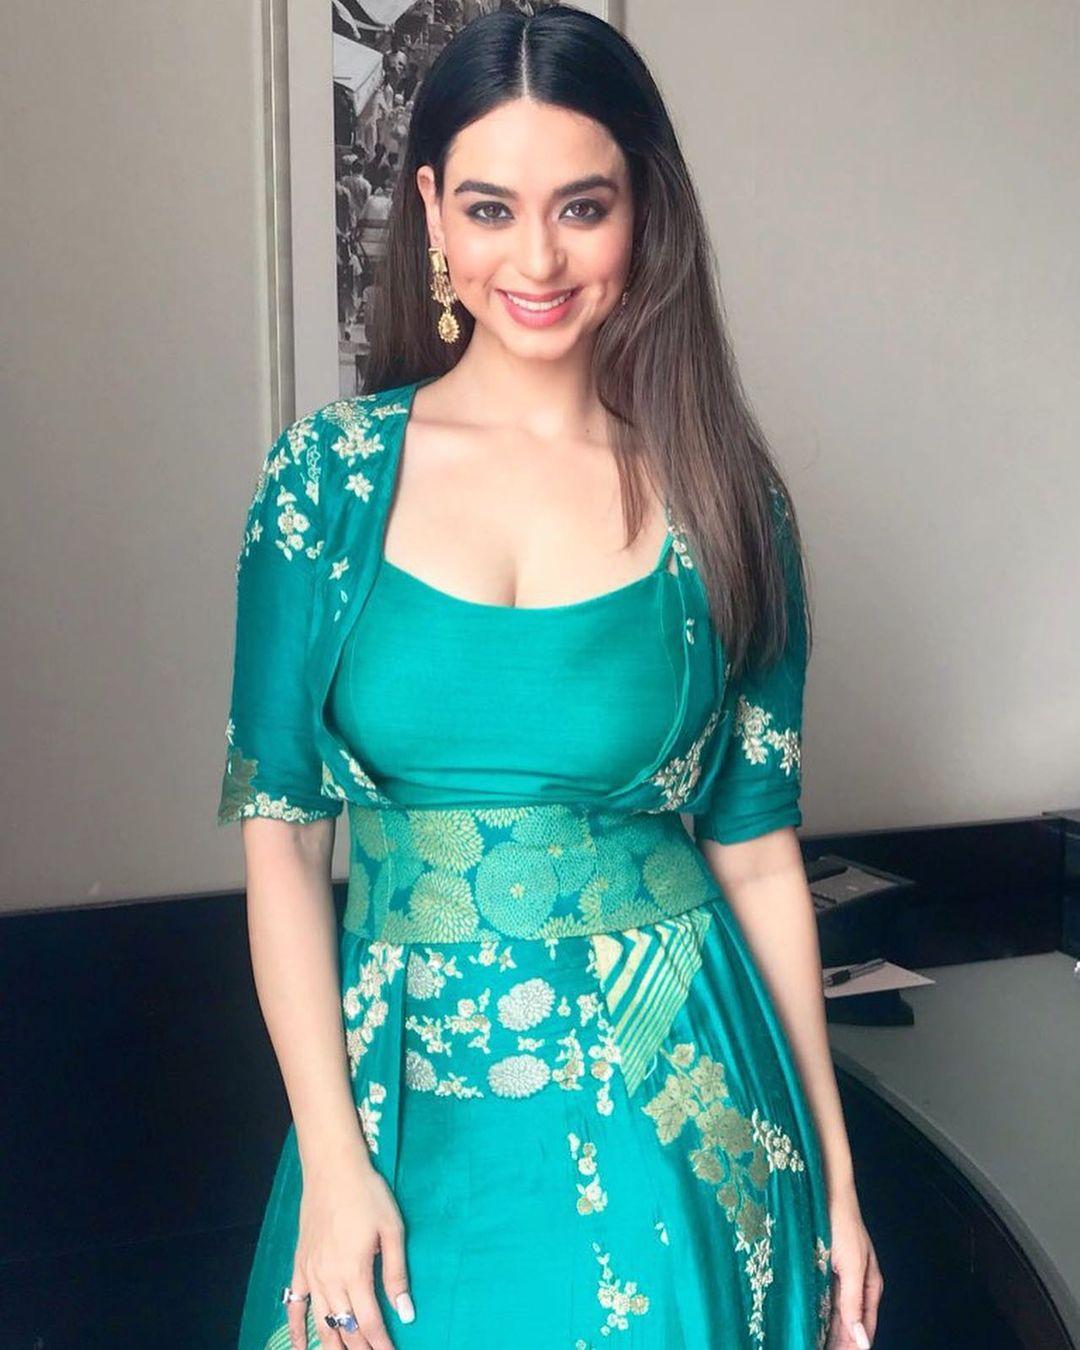 Beauty Queen Soundarya Sharma Photos (13)